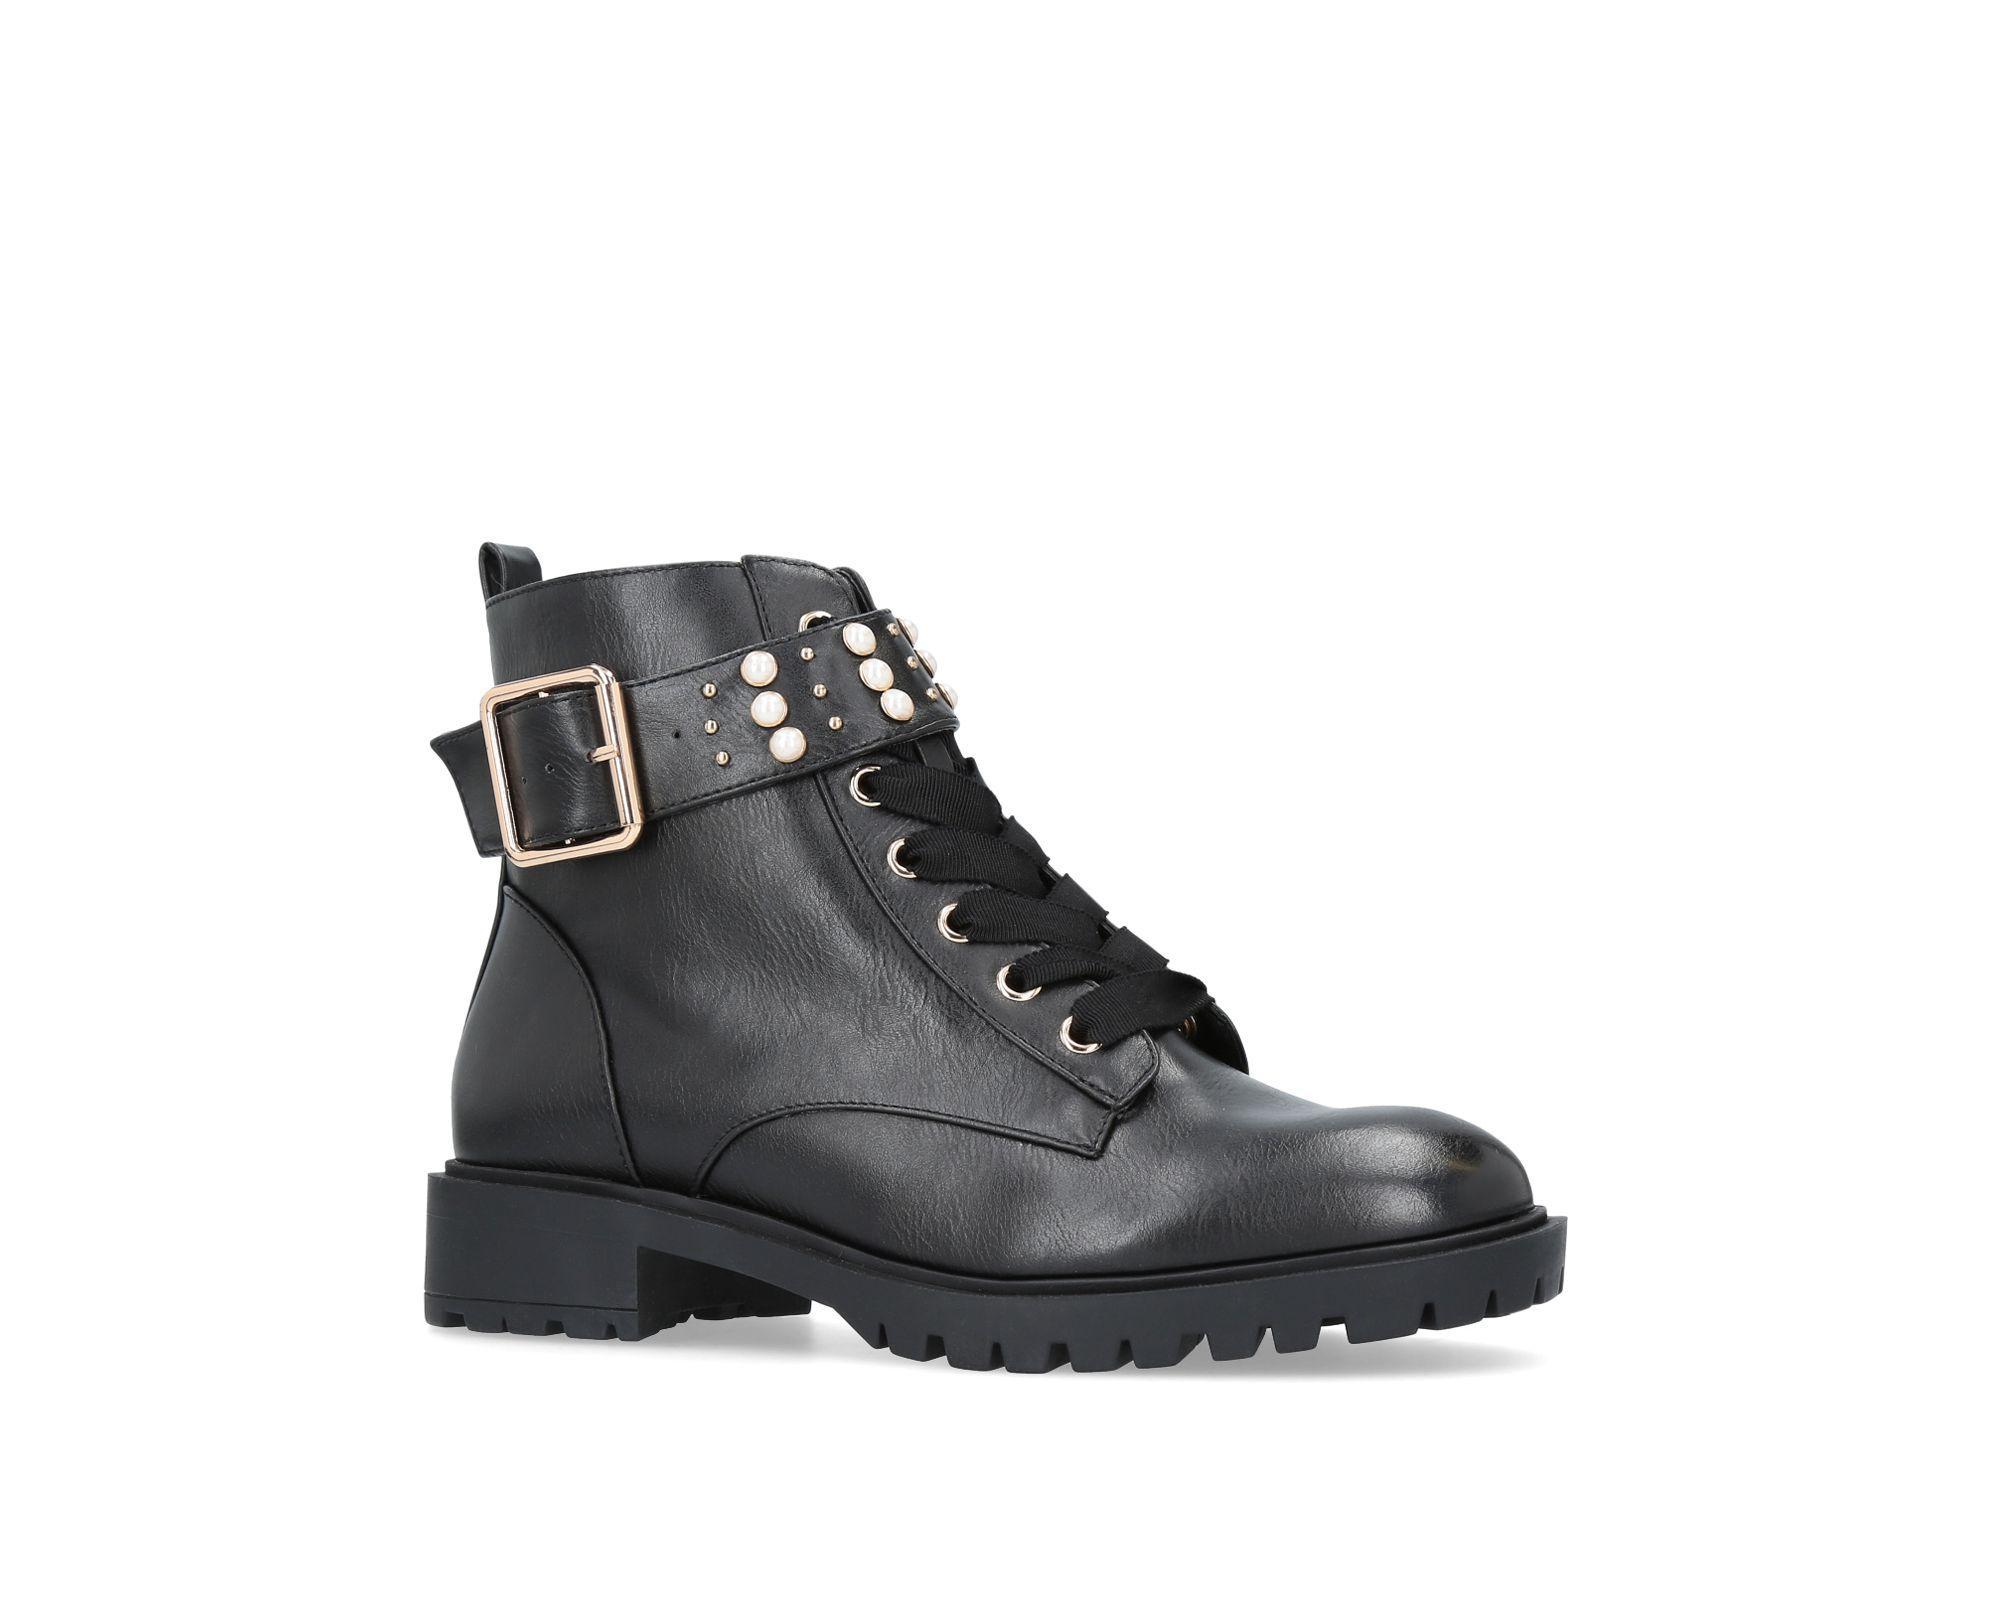 b2ff6e433cb Women's Black Hatty' Flat Ankle Boots